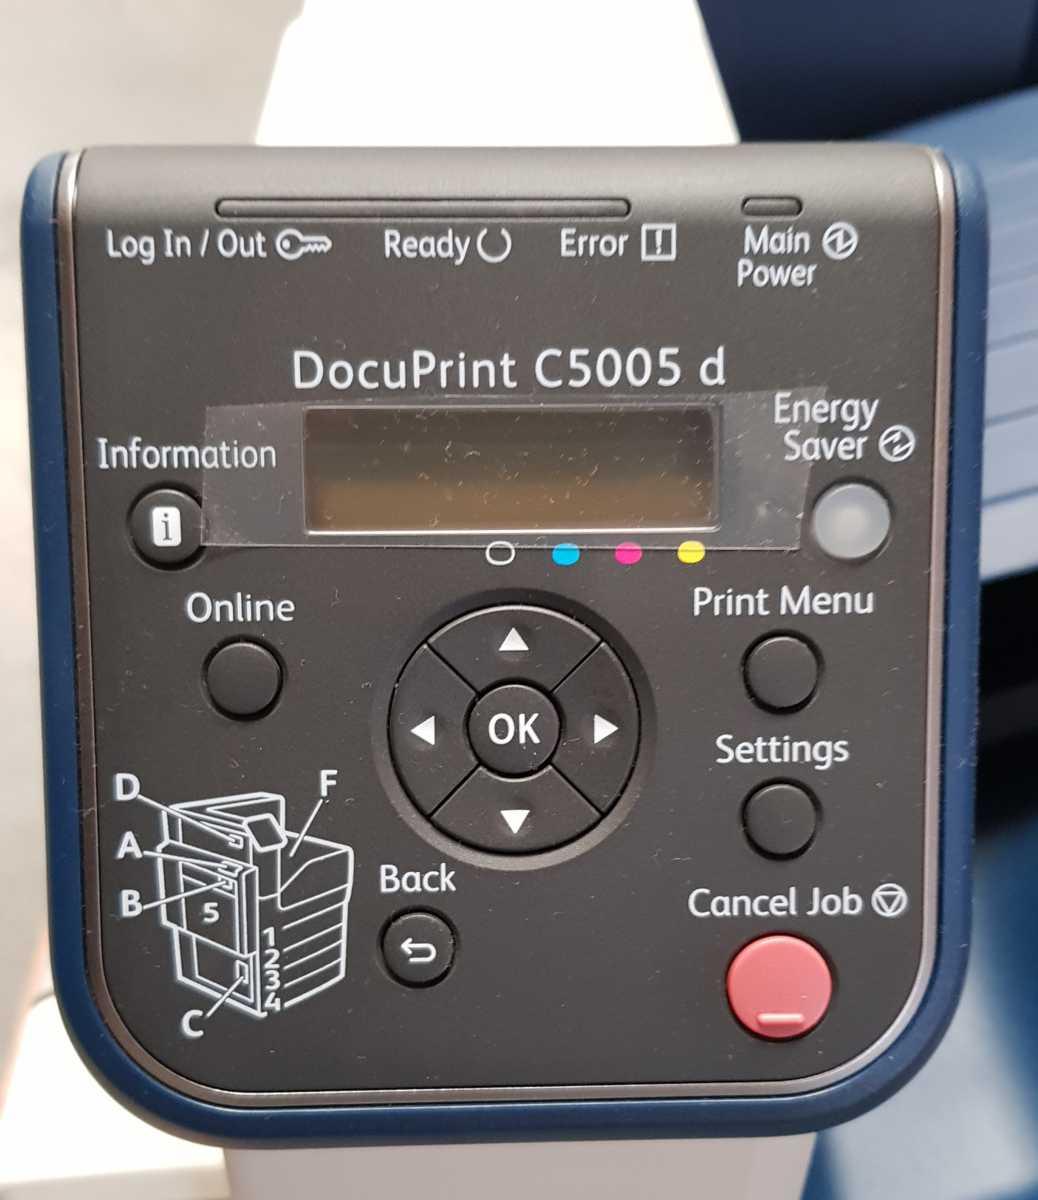 Xerox C5005d - Control panel still has plastic protector on it